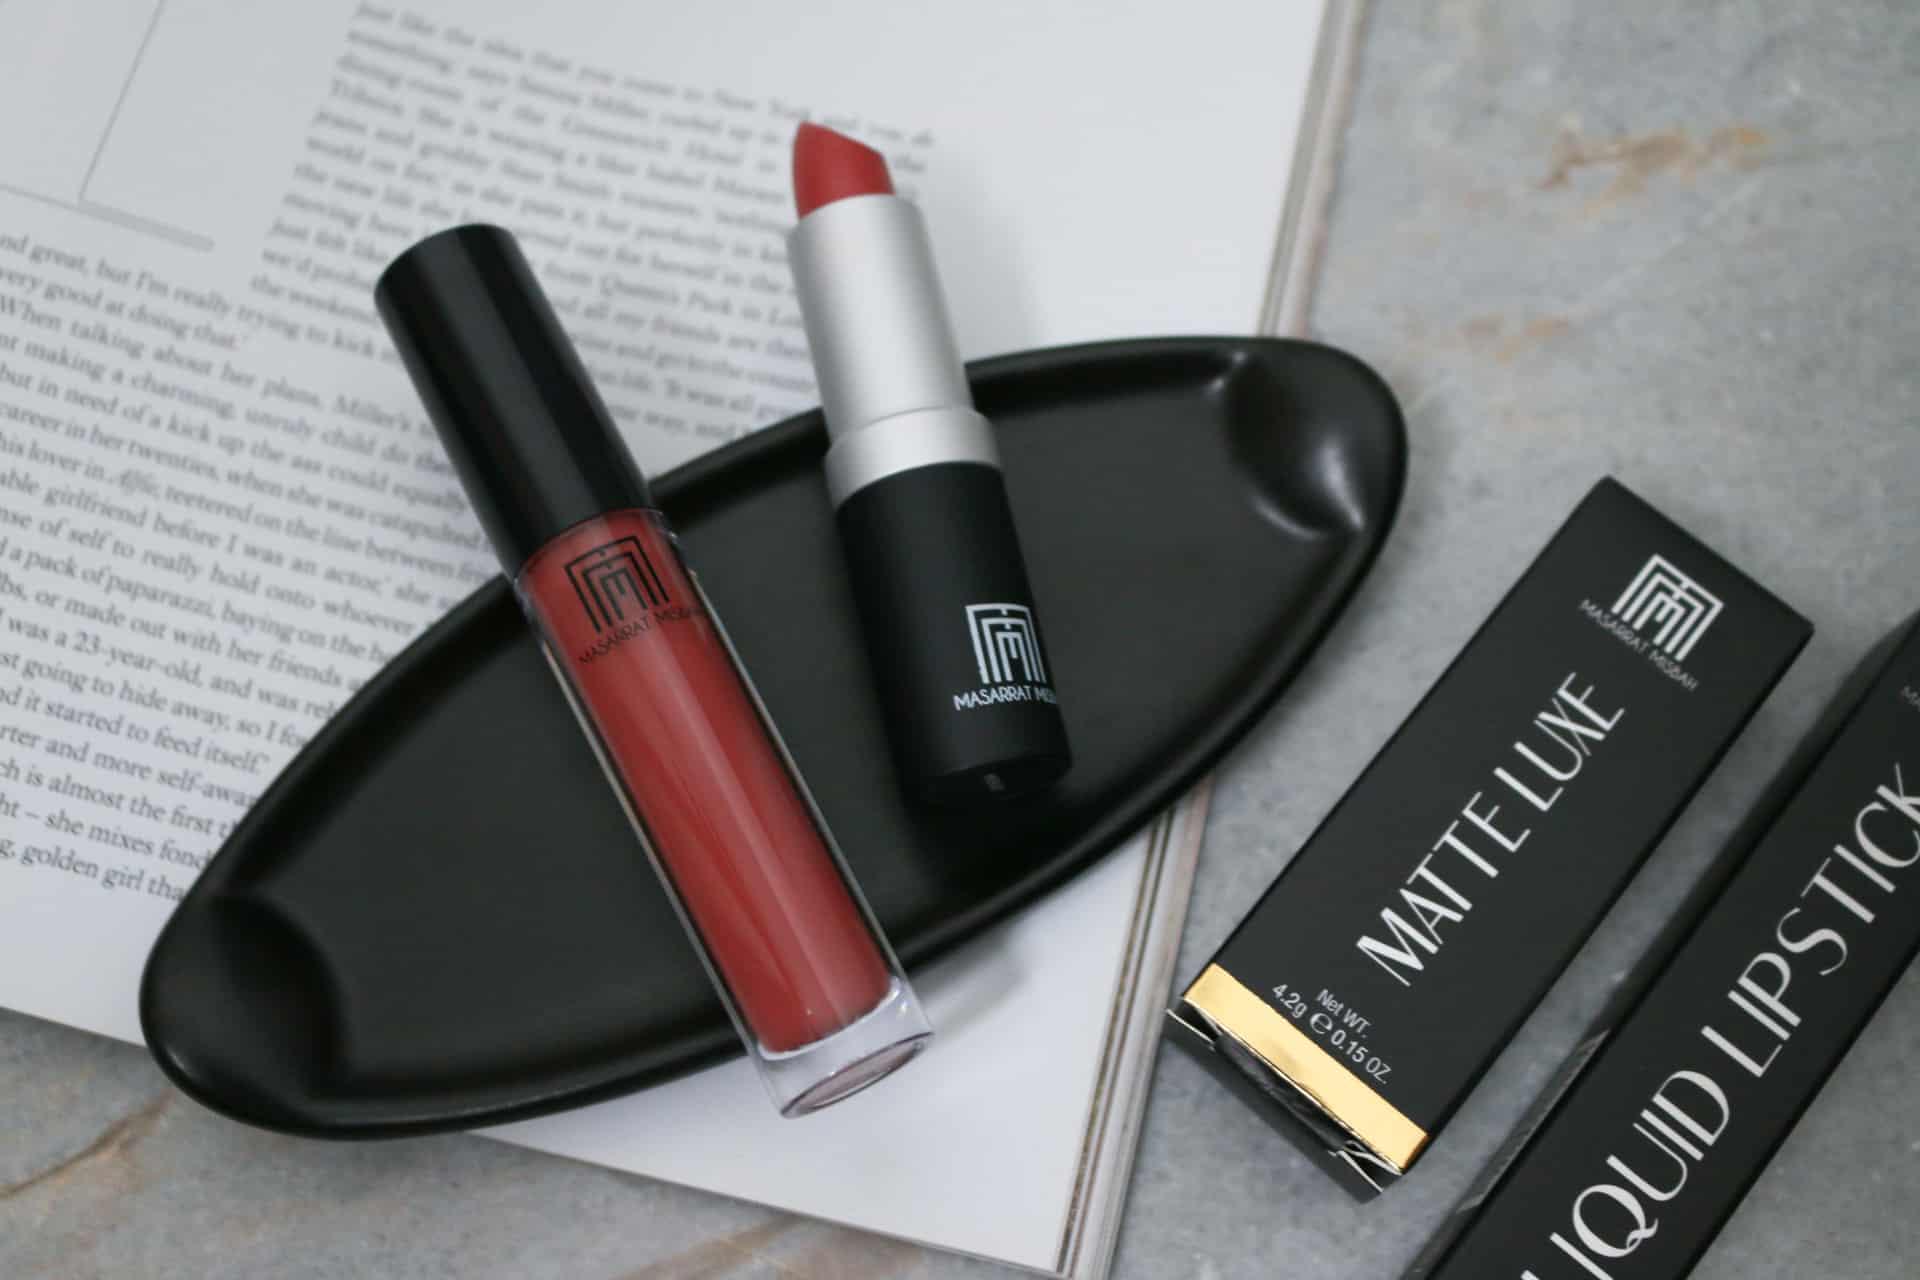 Masarrat Misbah Dolce Vita and Athena Lipsticks